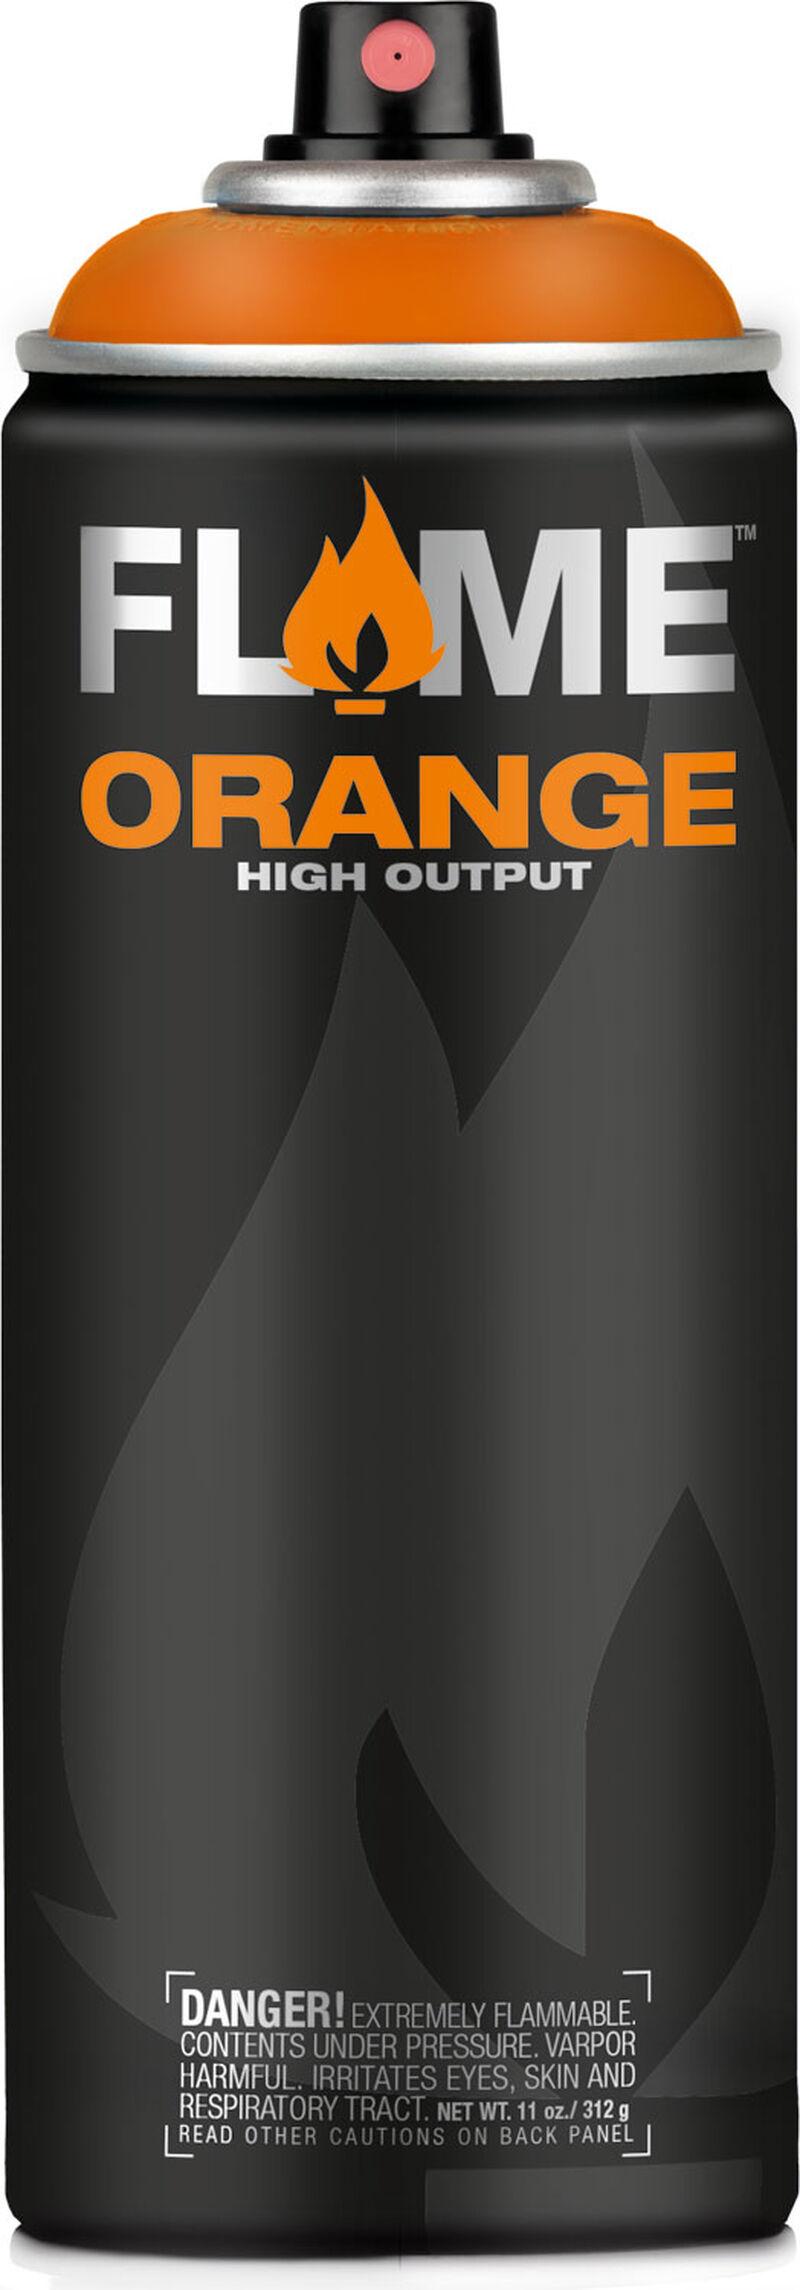 Flame Orange 400 ml